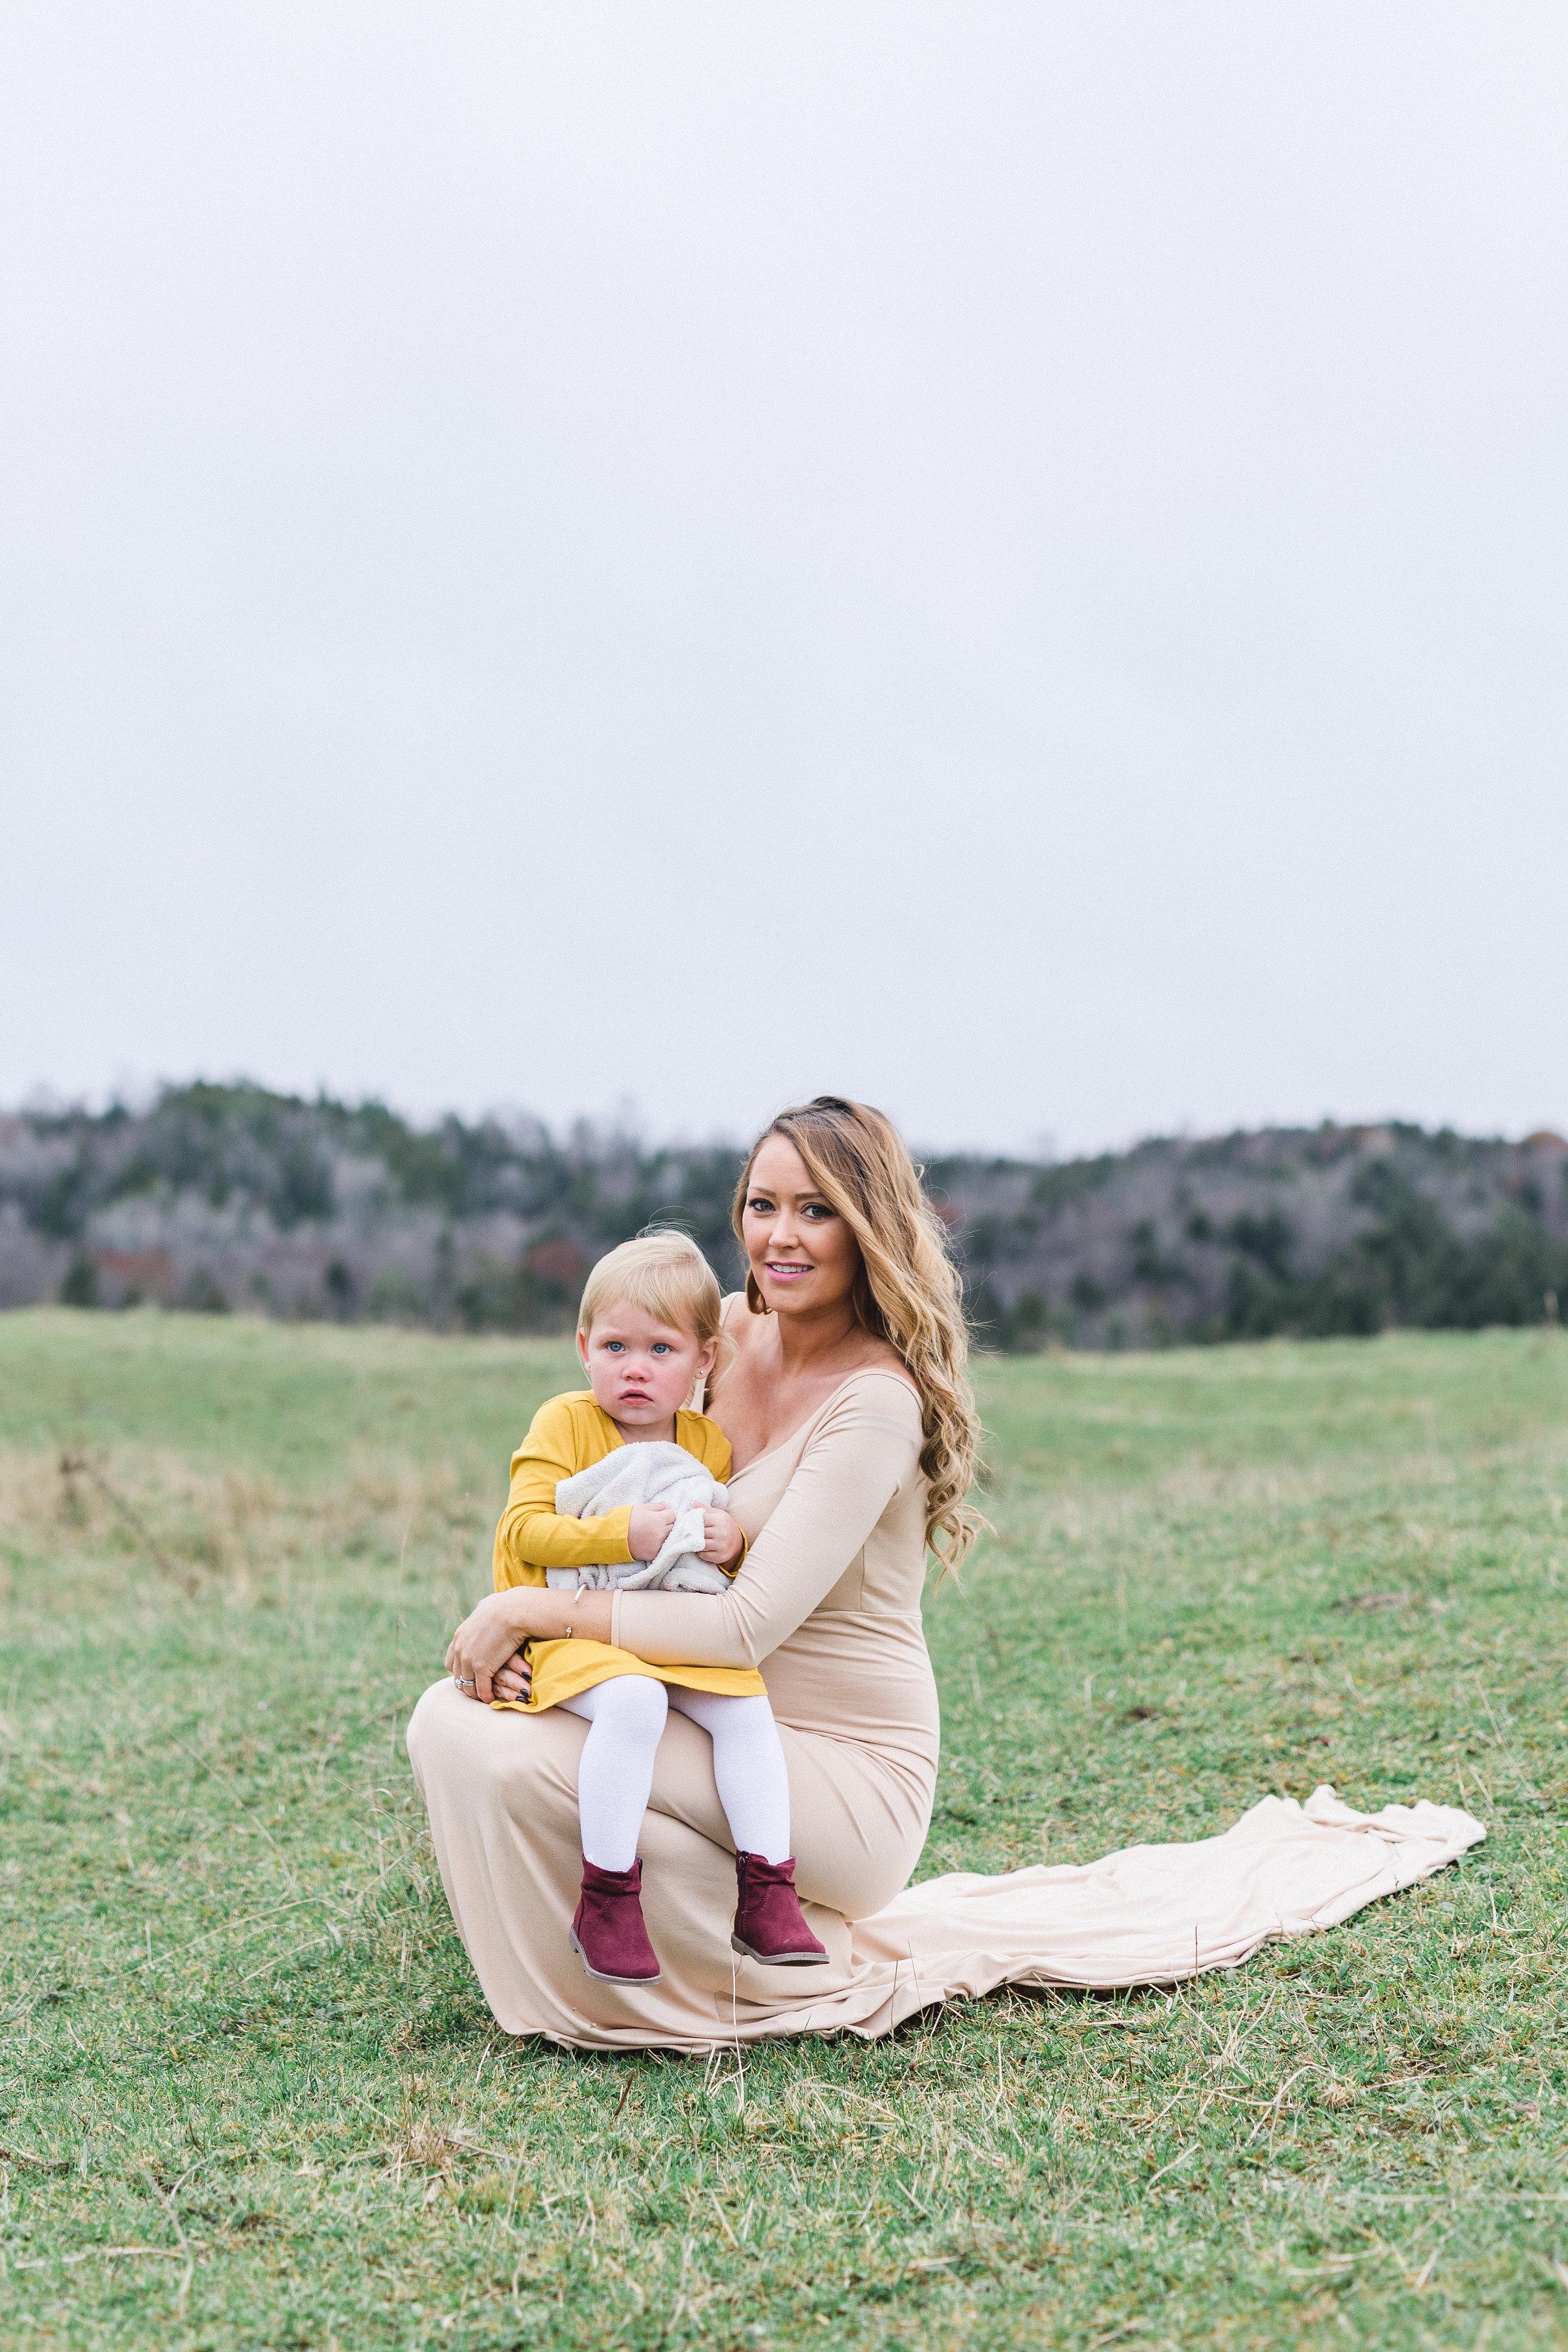 Maternity-photos-horse-garland-snow-wakefield-ontario-ottawa-11.jpg